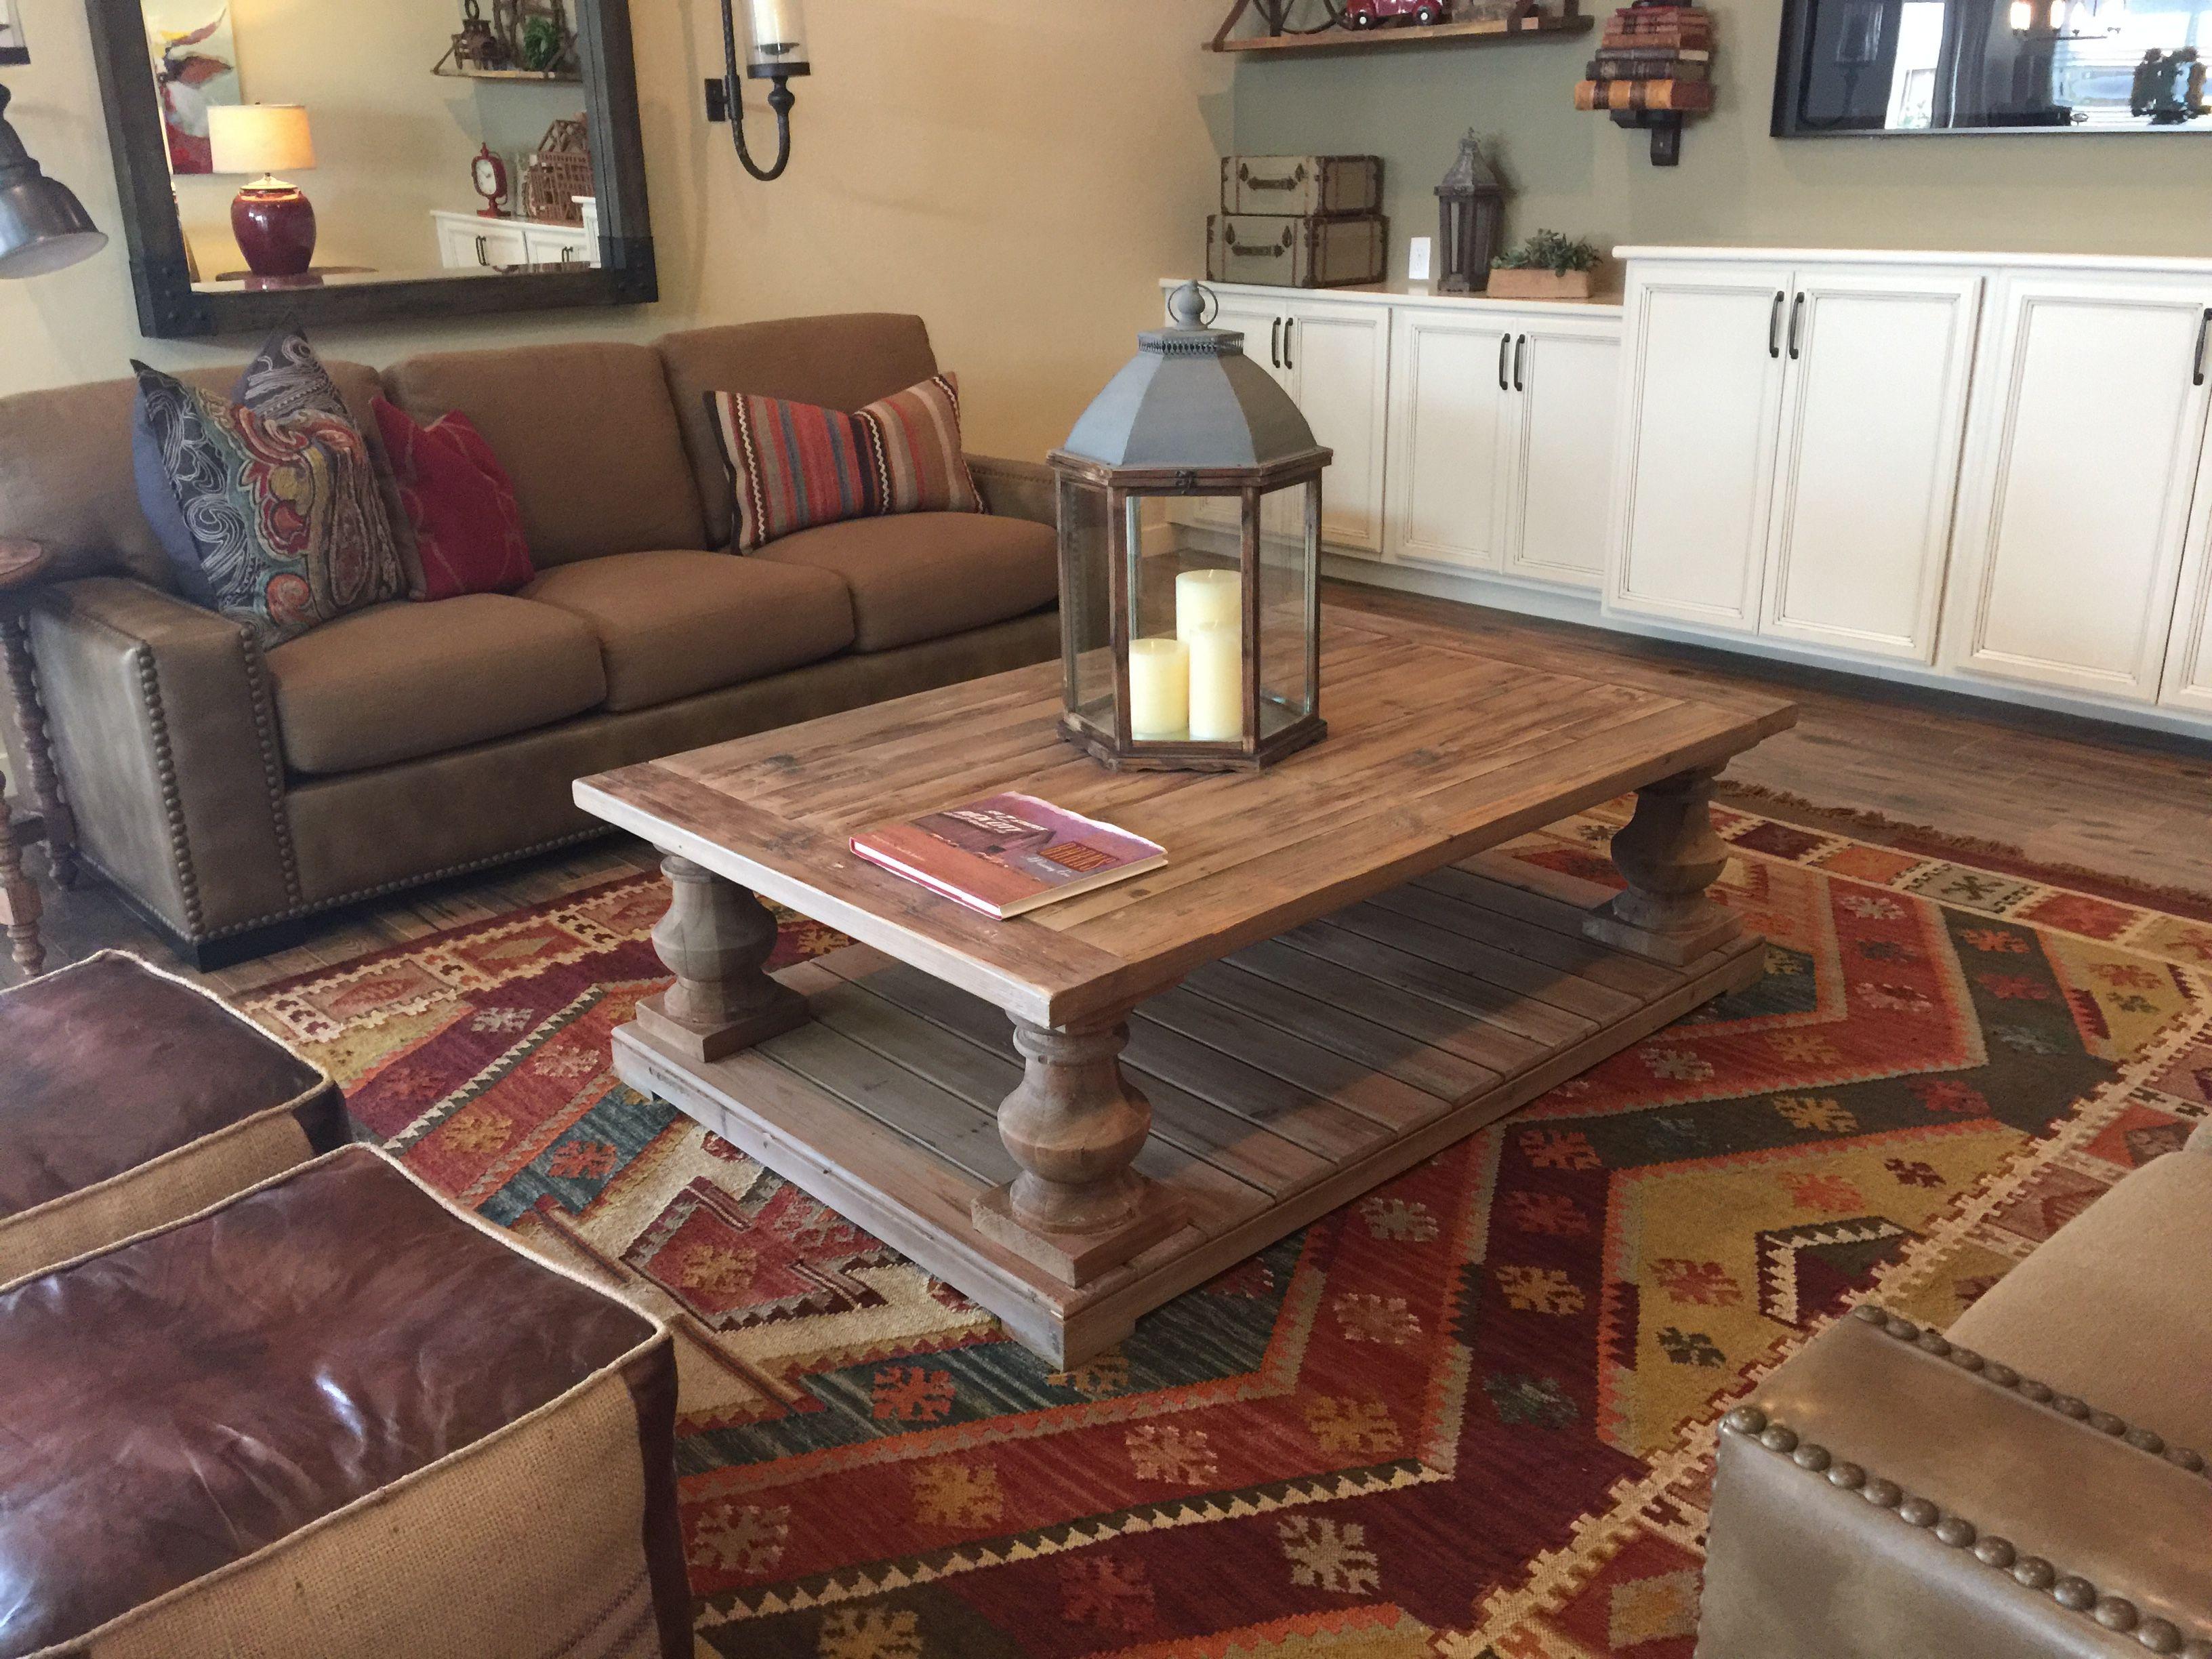 pinmona williams on furniture  rustic living room